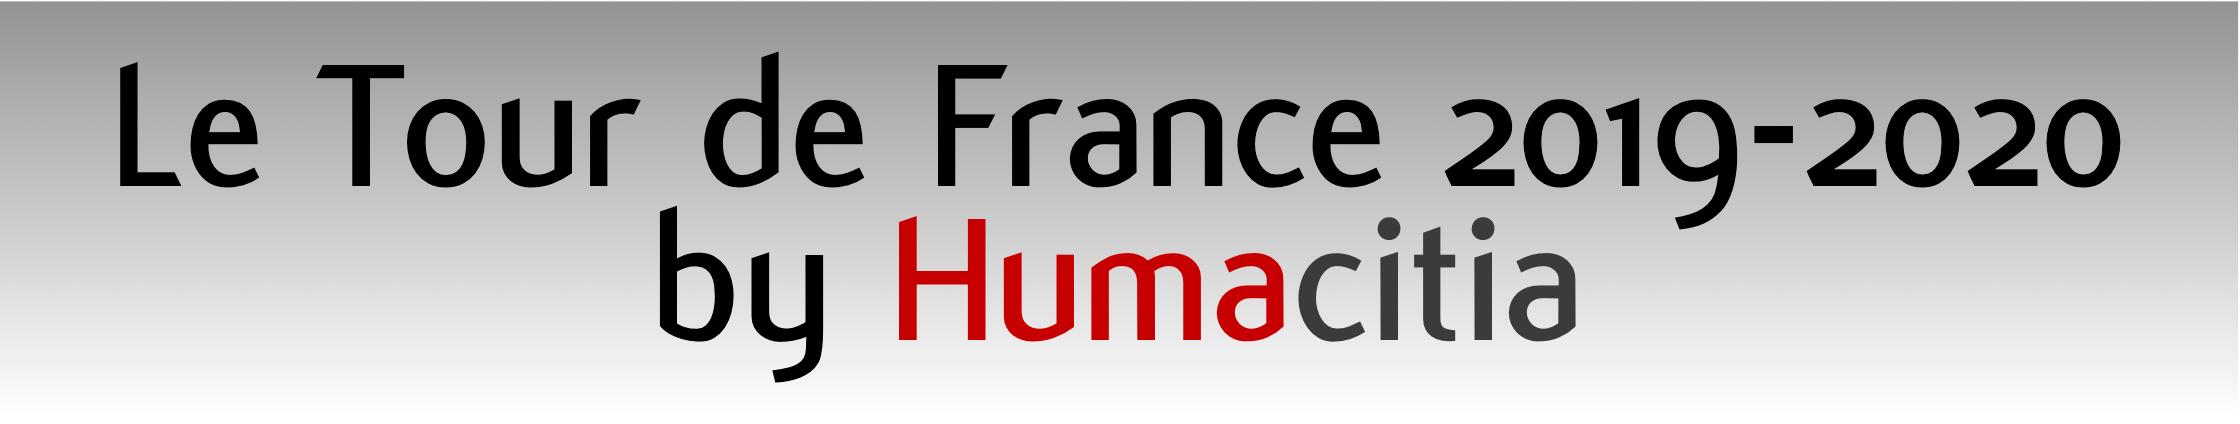 TDF 2019-2020 by Humacitia